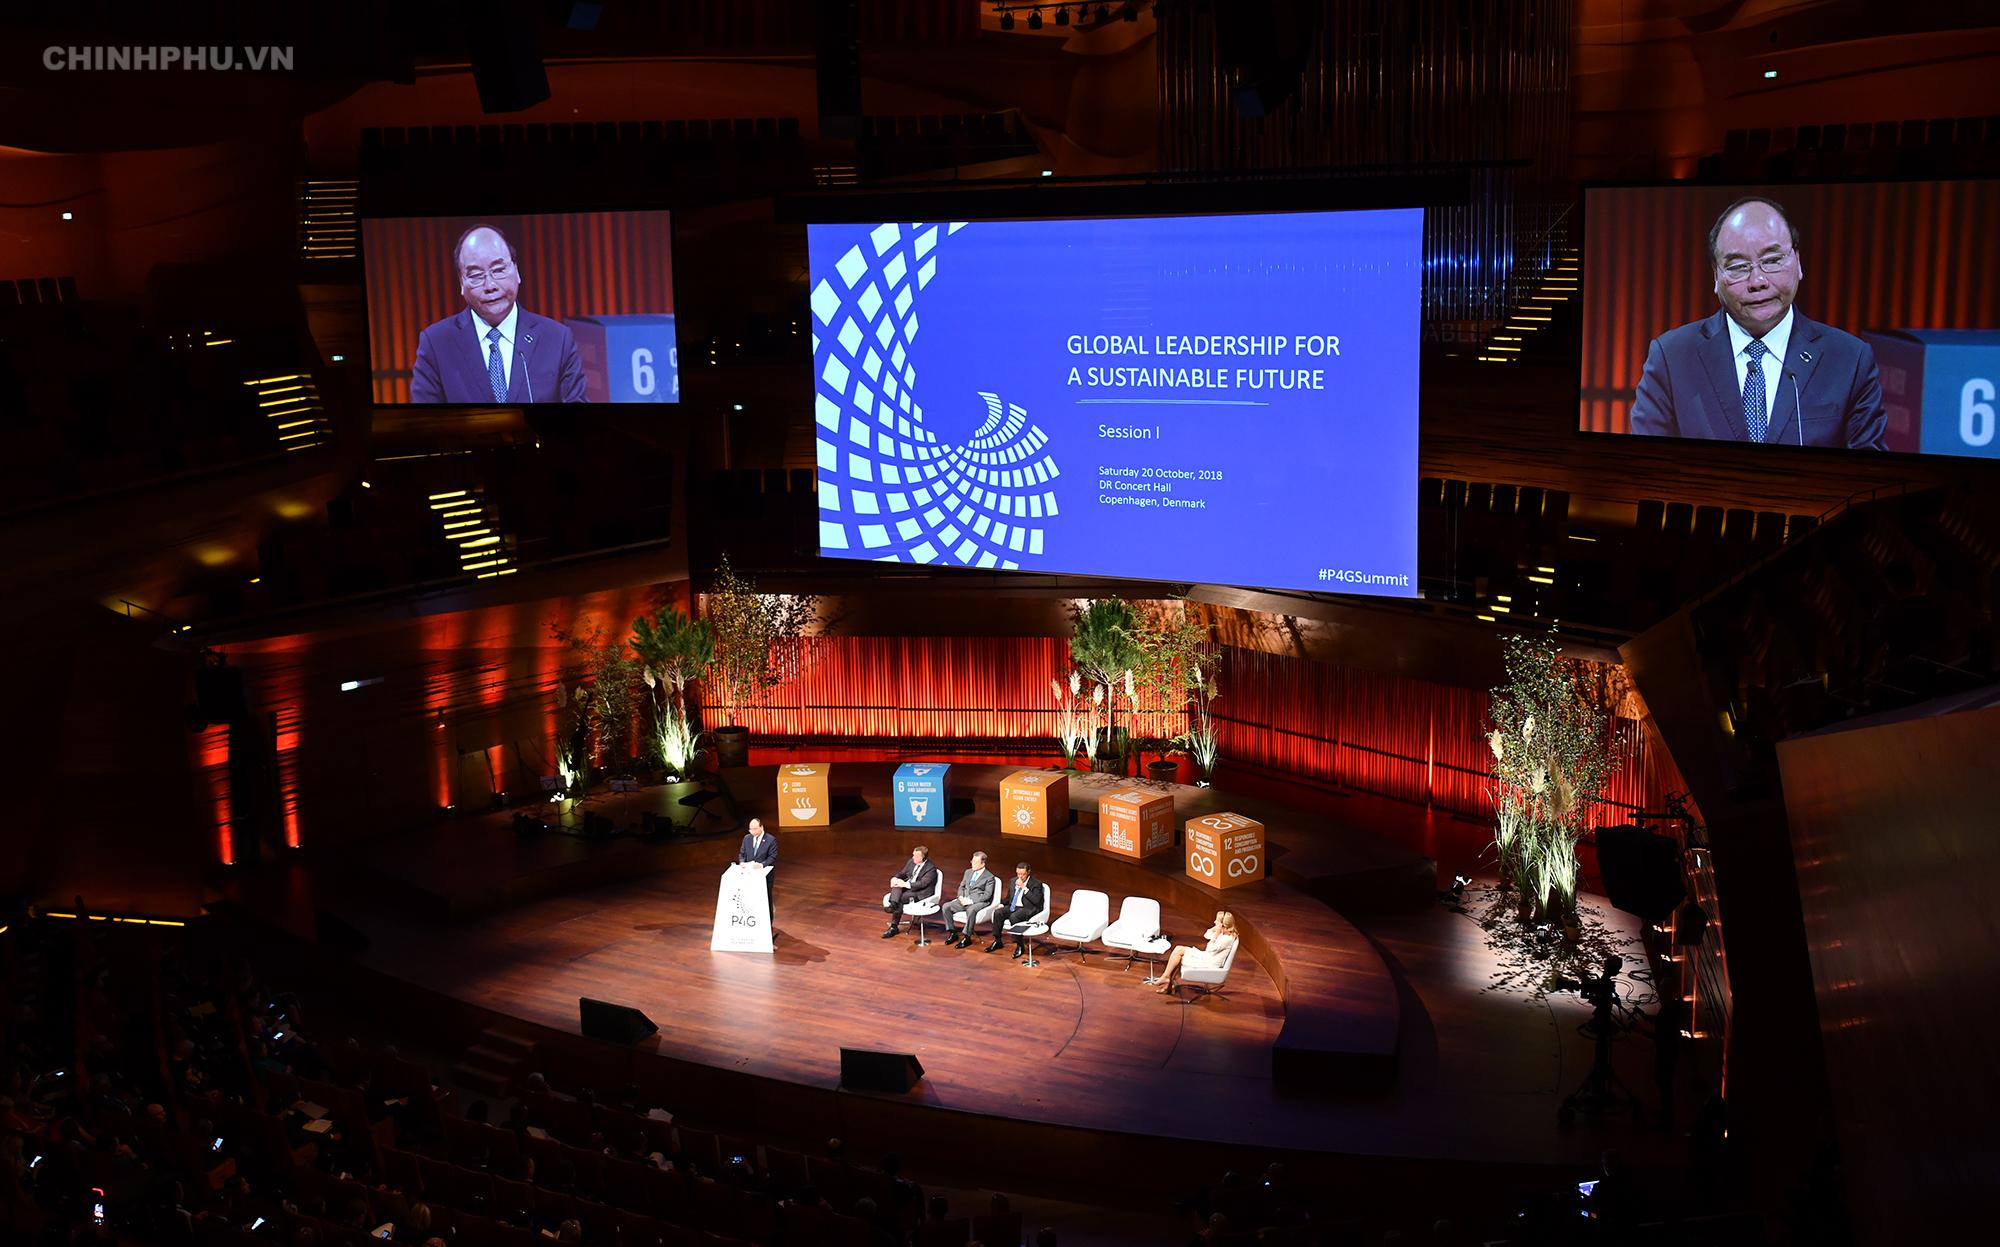 Vietnamese PM vows to realize global goals at P4G Copenhagen Summit